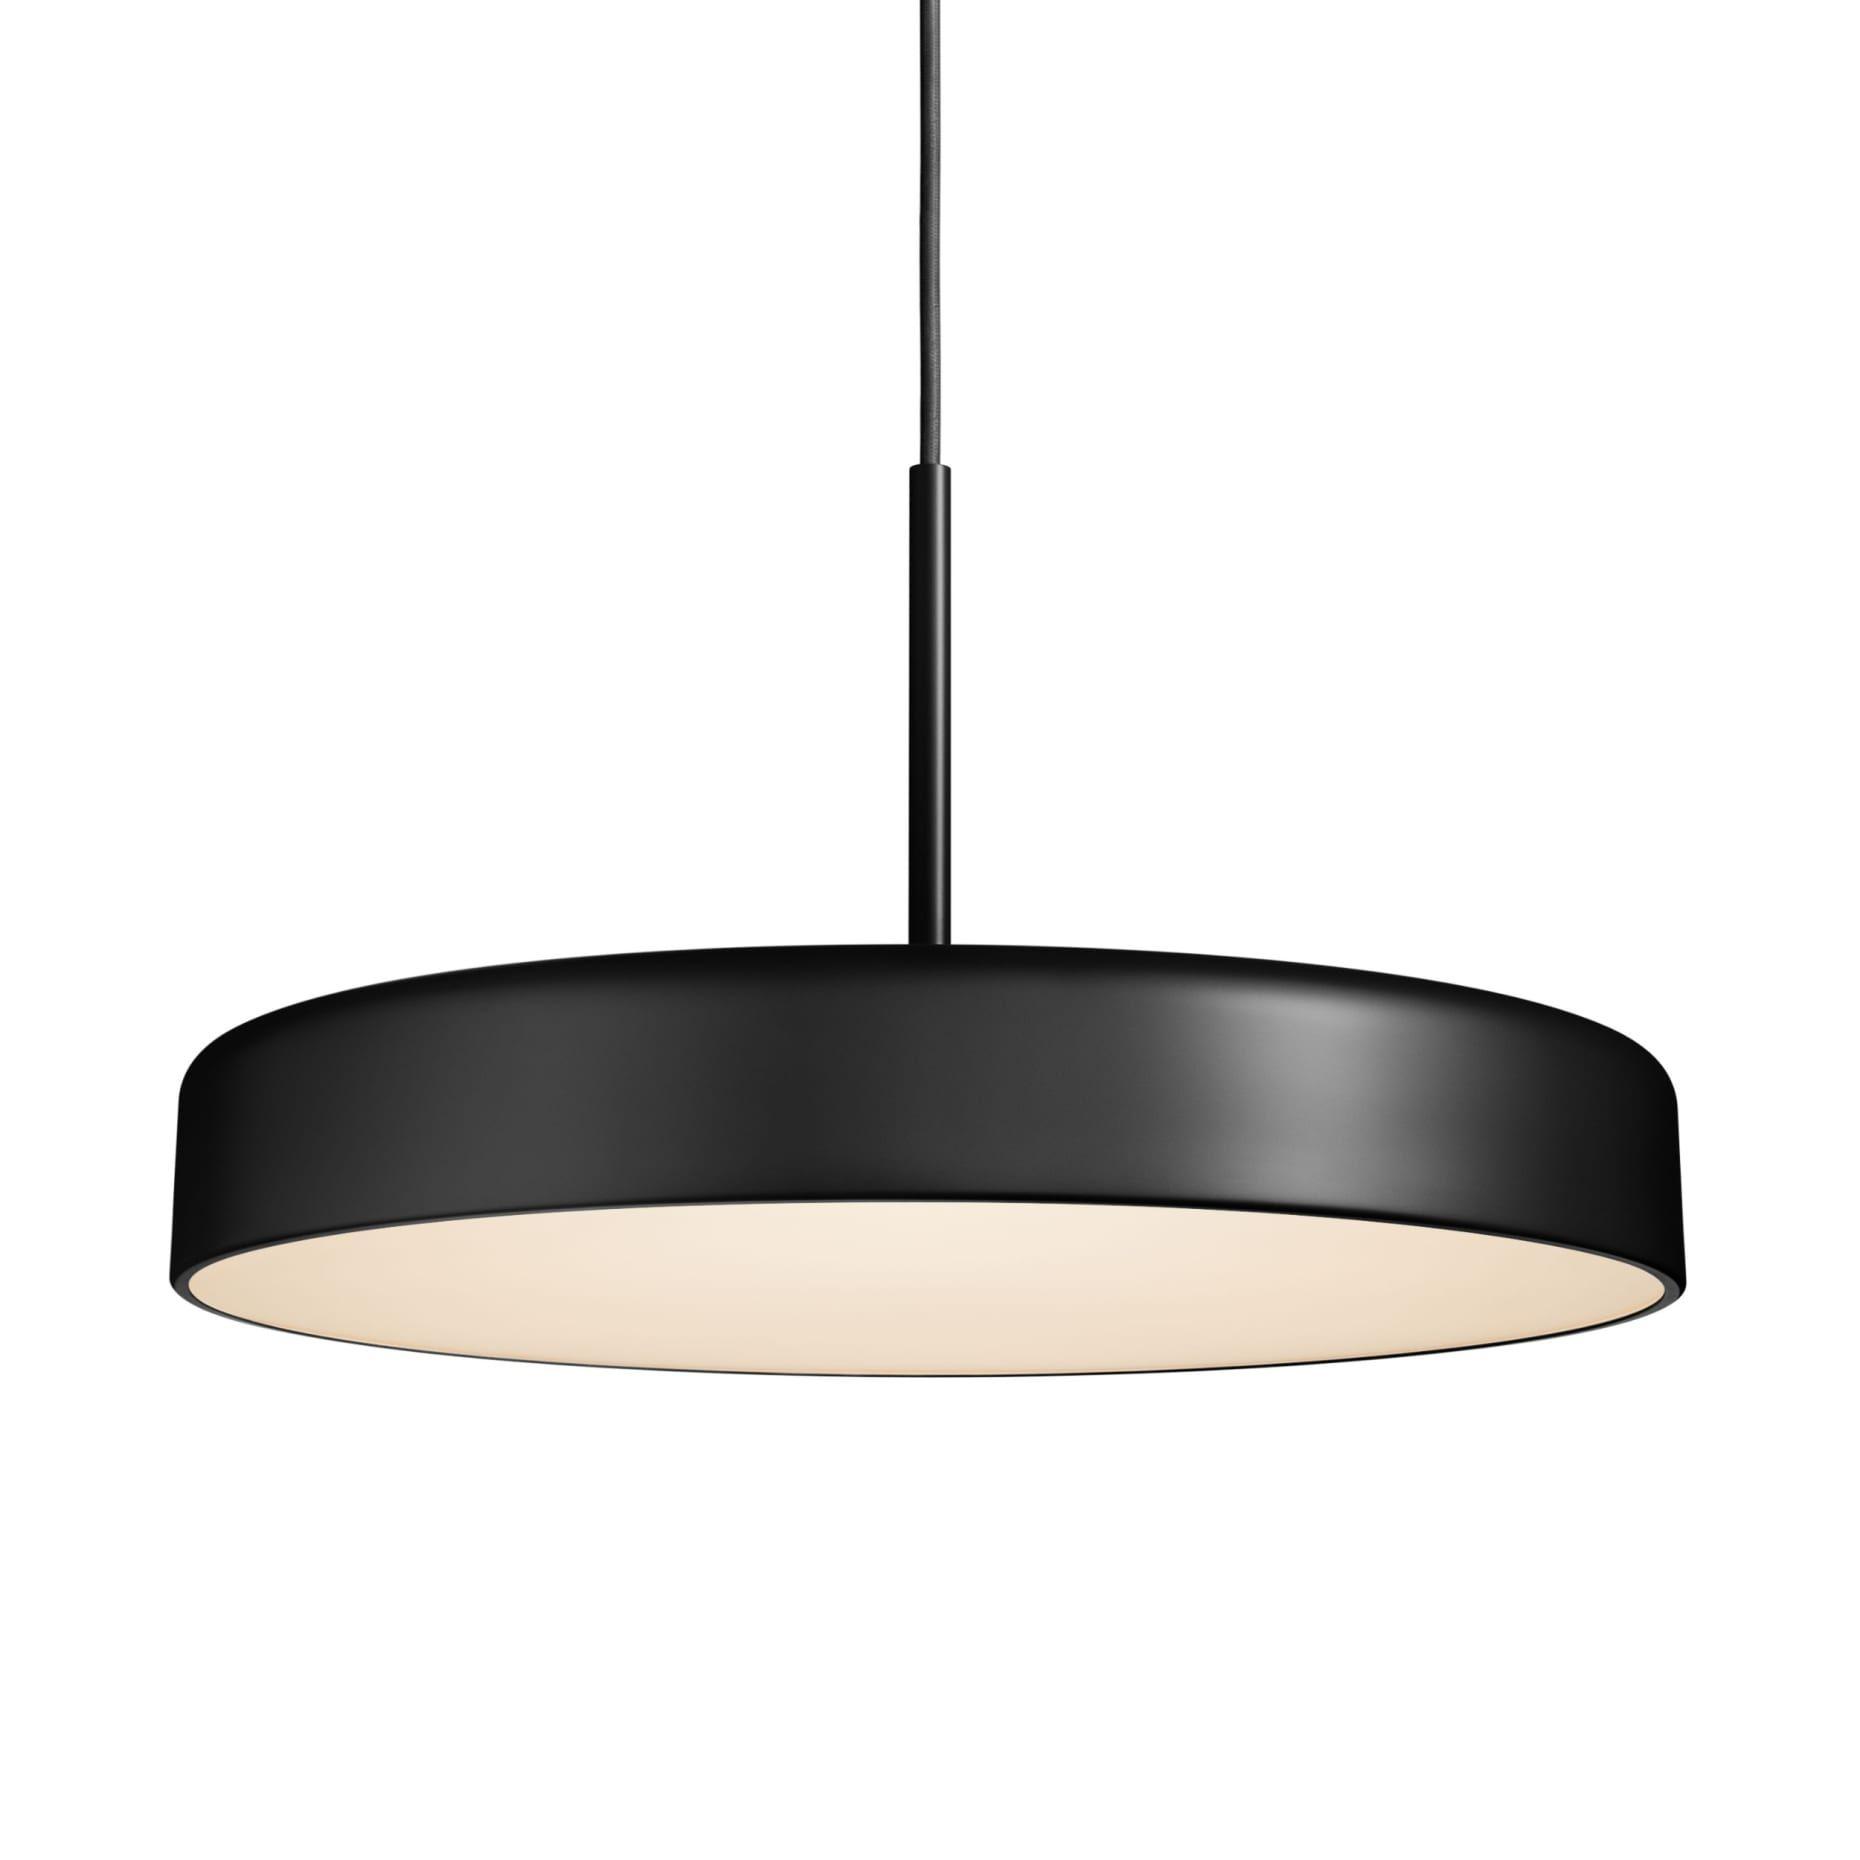 Modern Large Pendant Lighting Home Interior Design Ideas Large Pendant Lighting Pendant Lighting Black Pendant Light